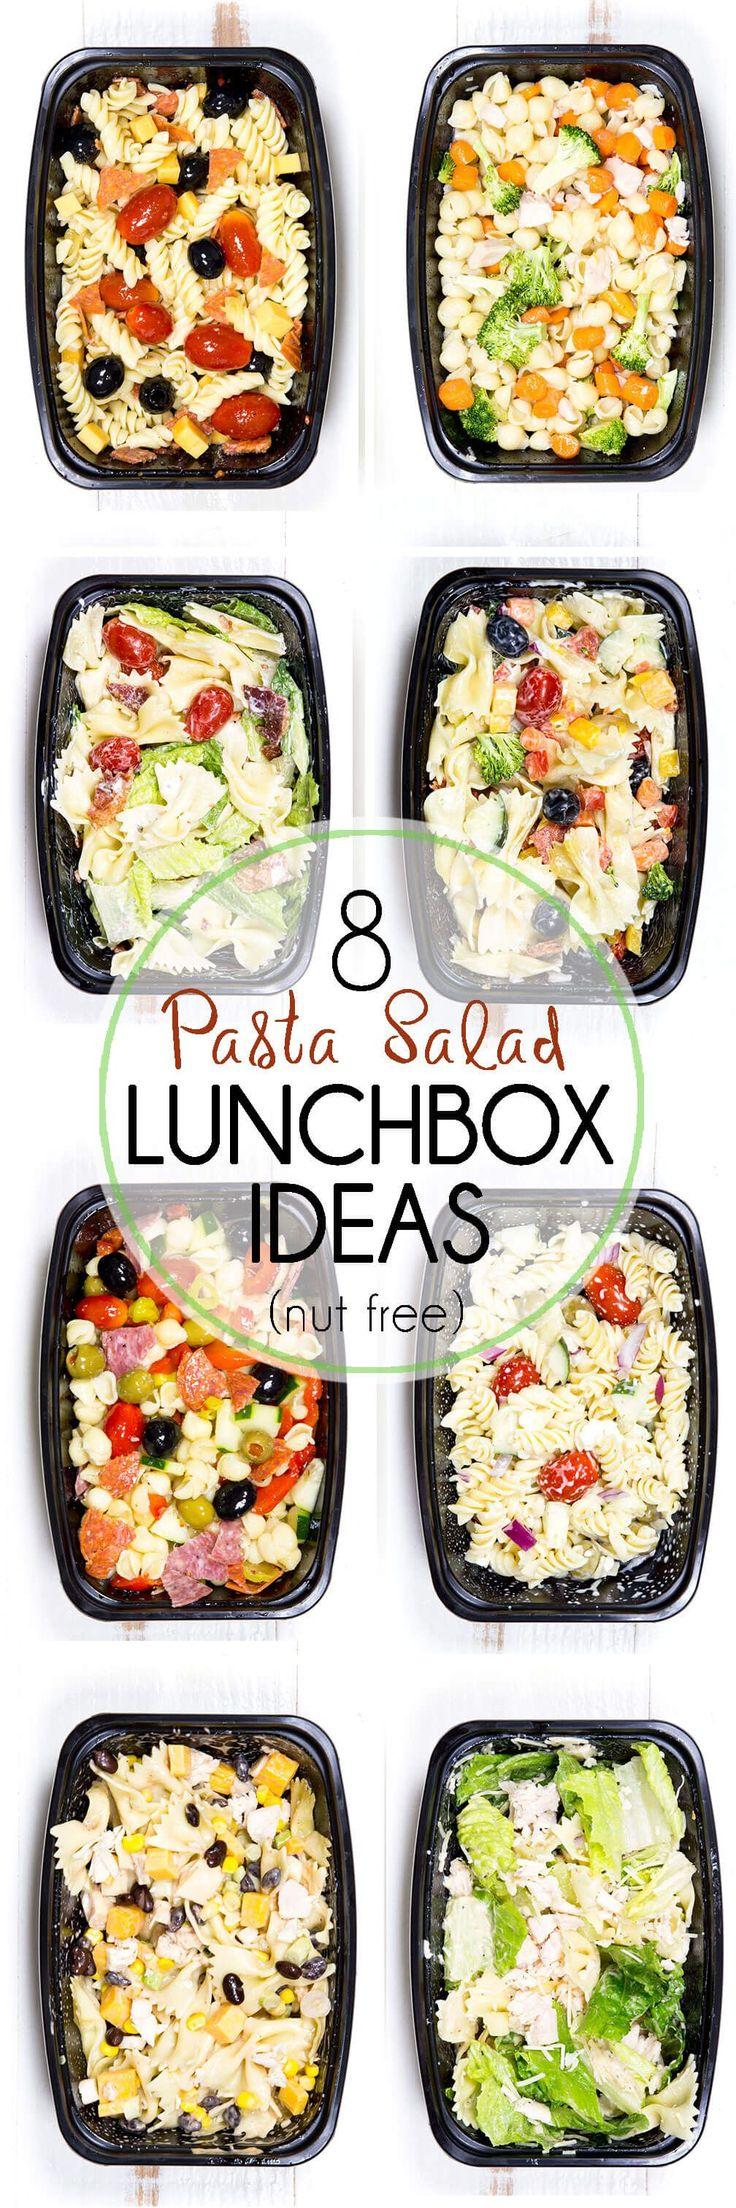 Pasta Salad Lunchbox Ideas #mealprep #organize #nomnom